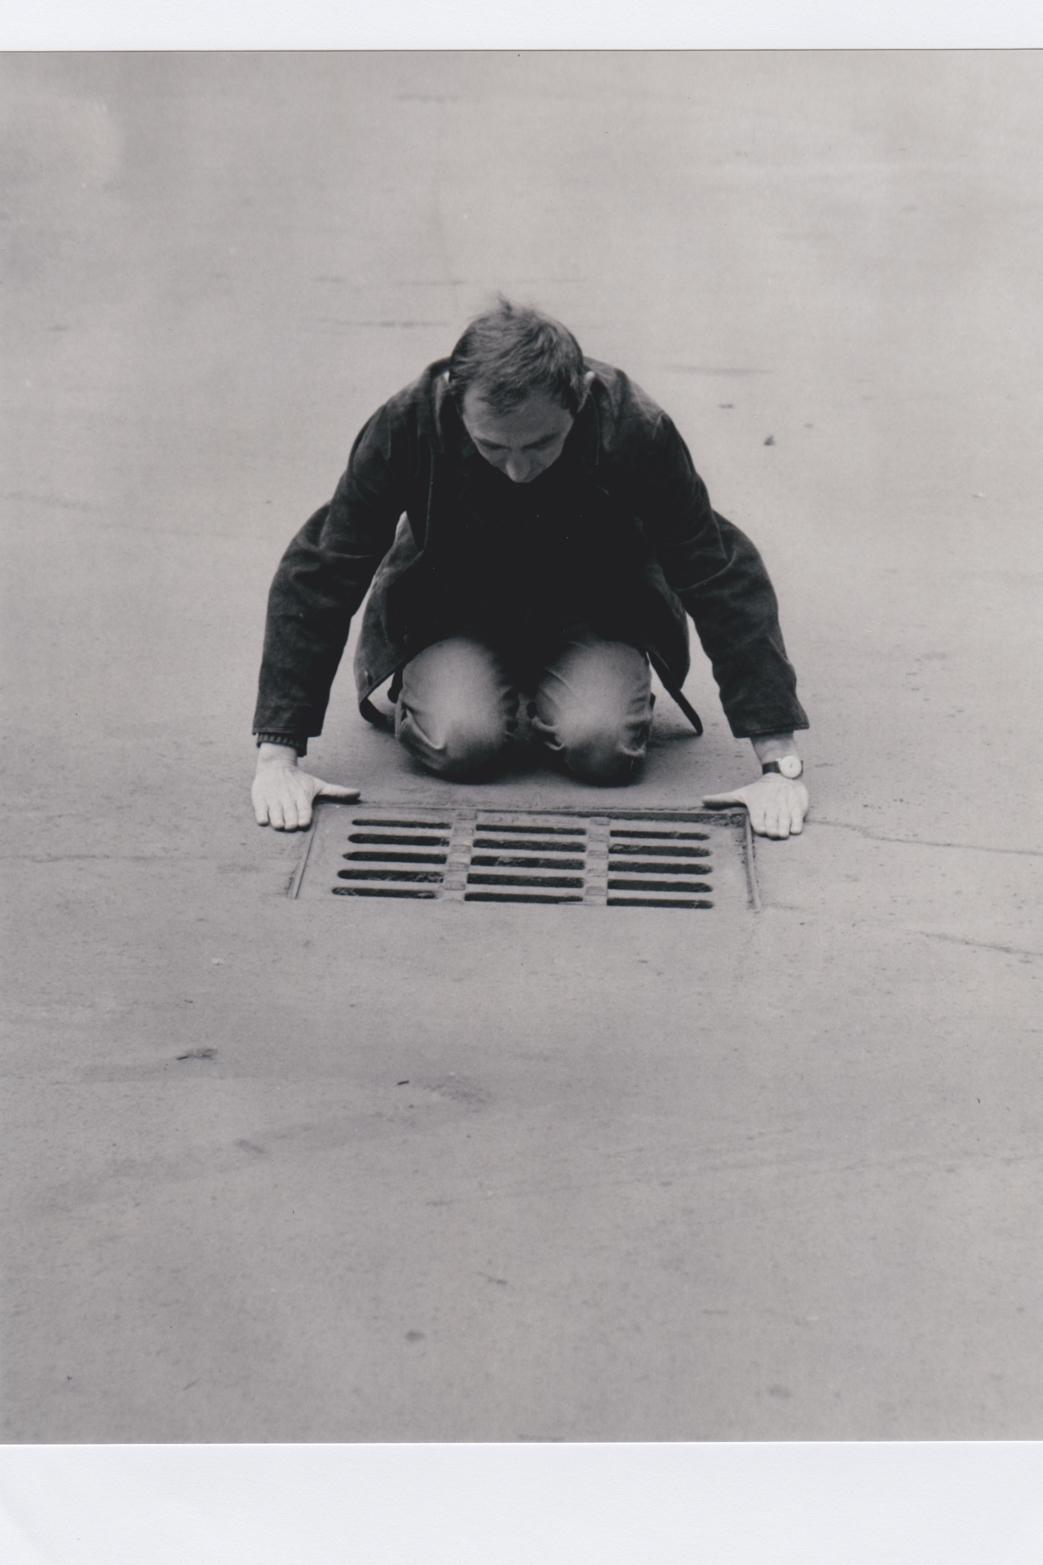 Karel Miler, Grating, 1974